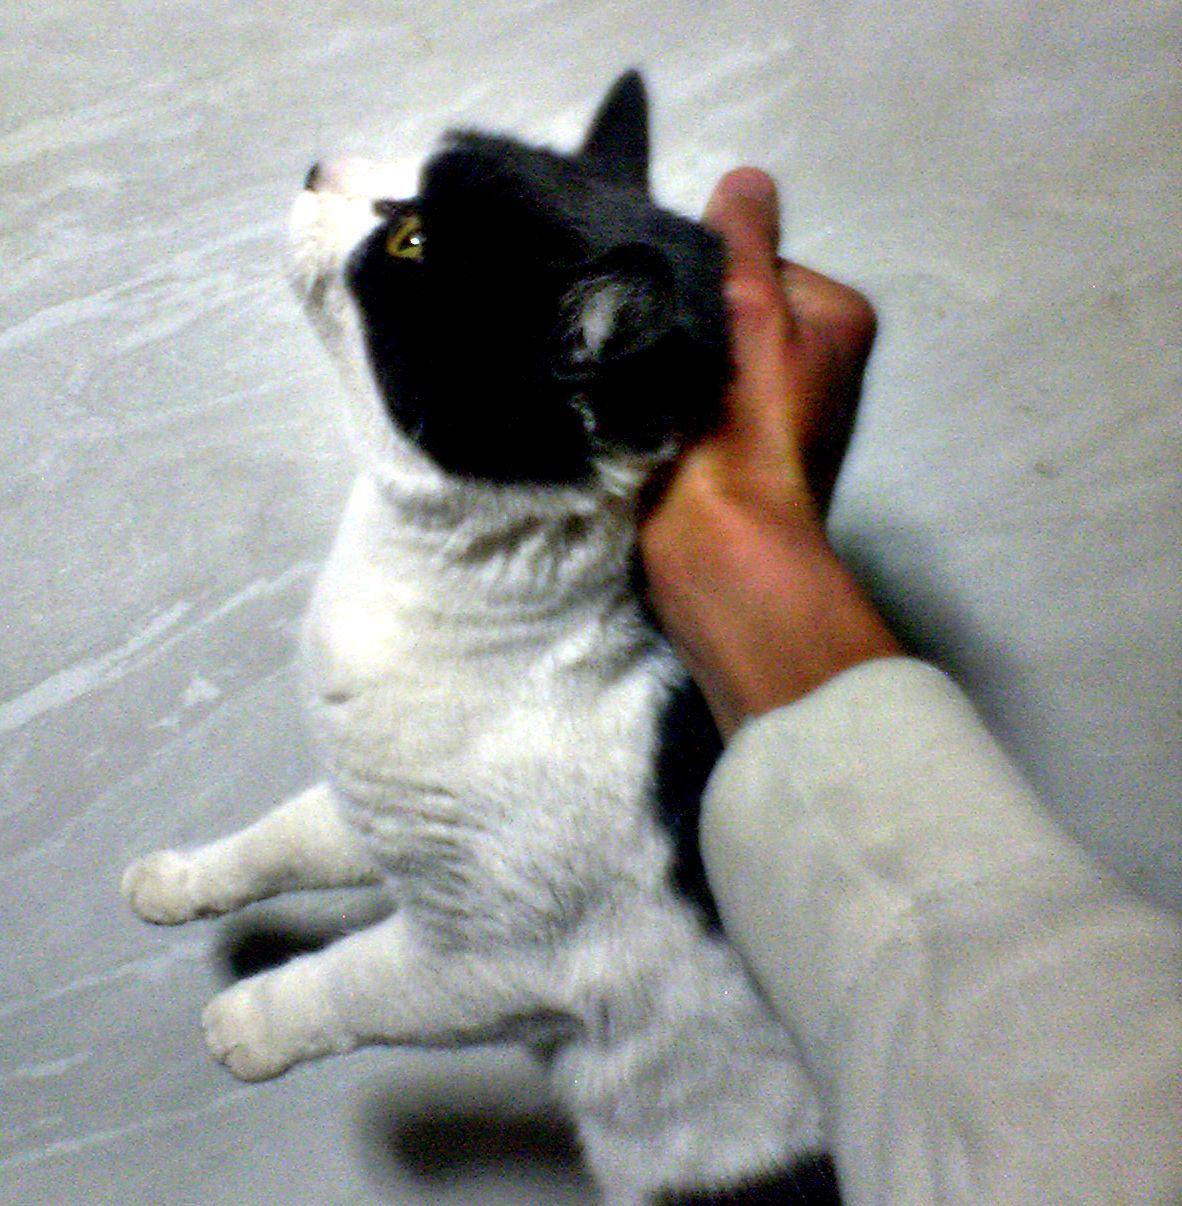 Grabbing A Cats Tongue While Its Out Gif